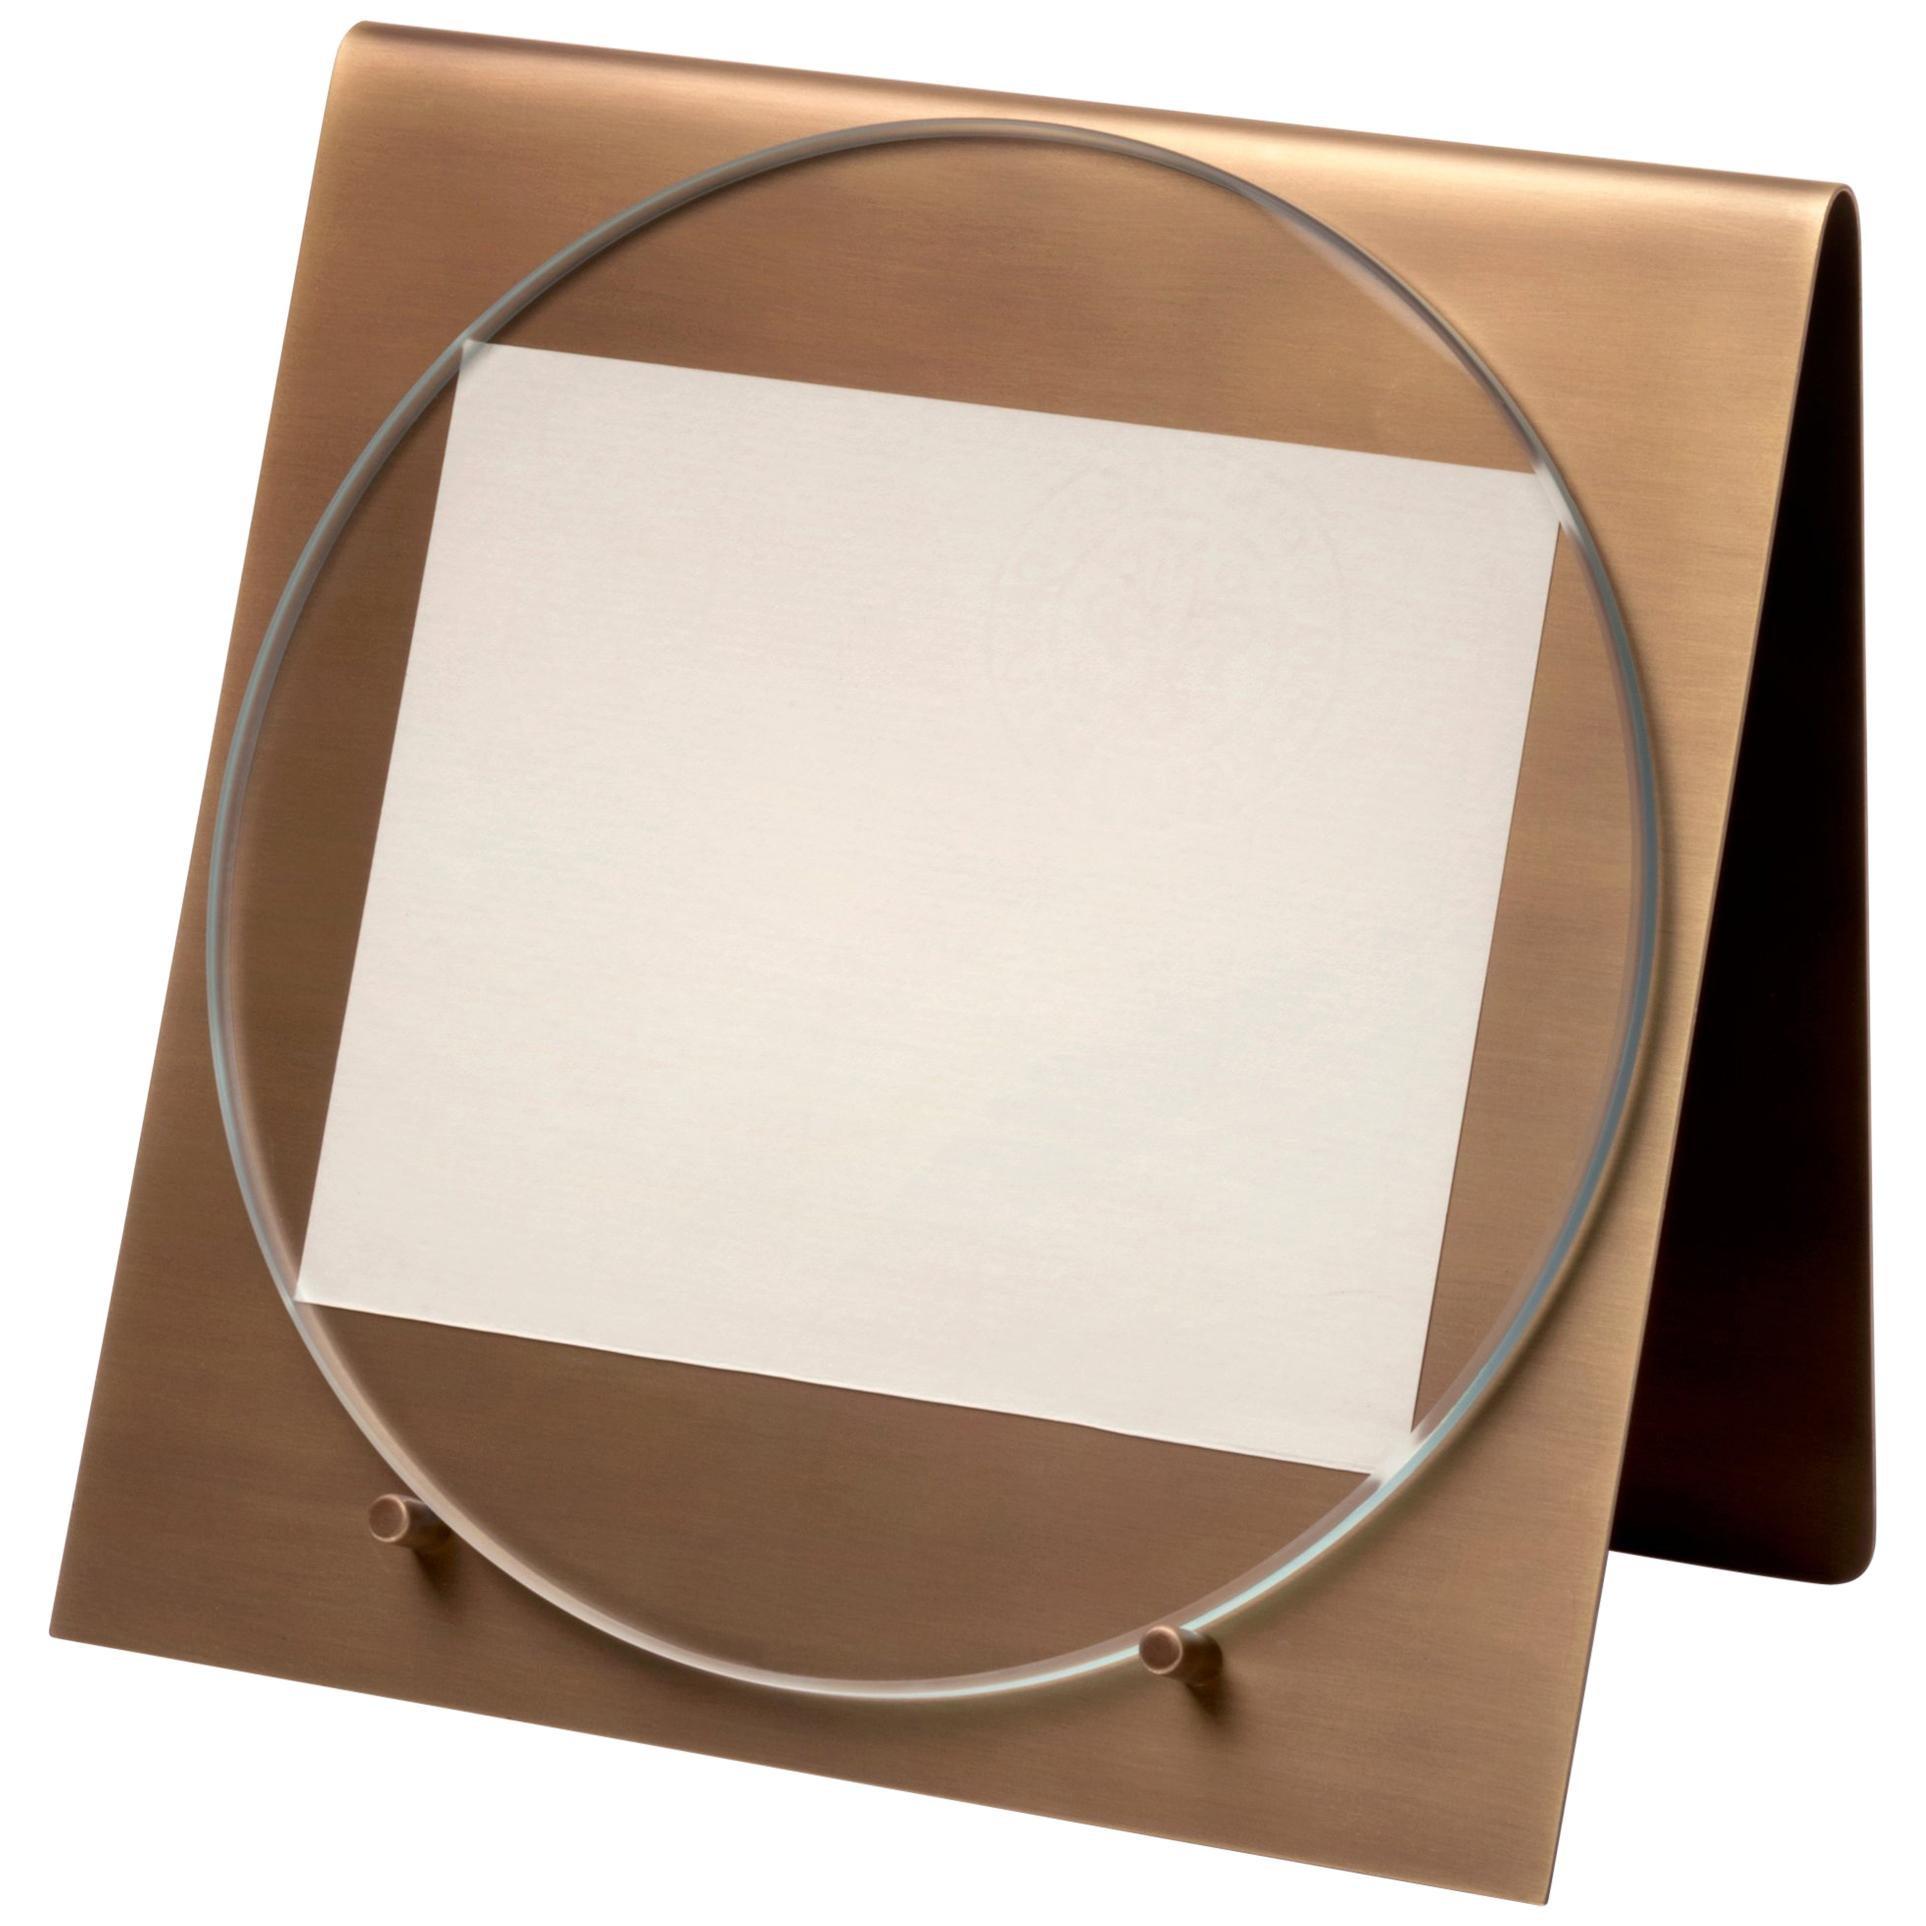 Salvatori Balancing Photo Frame in Brass by Studiocharlie